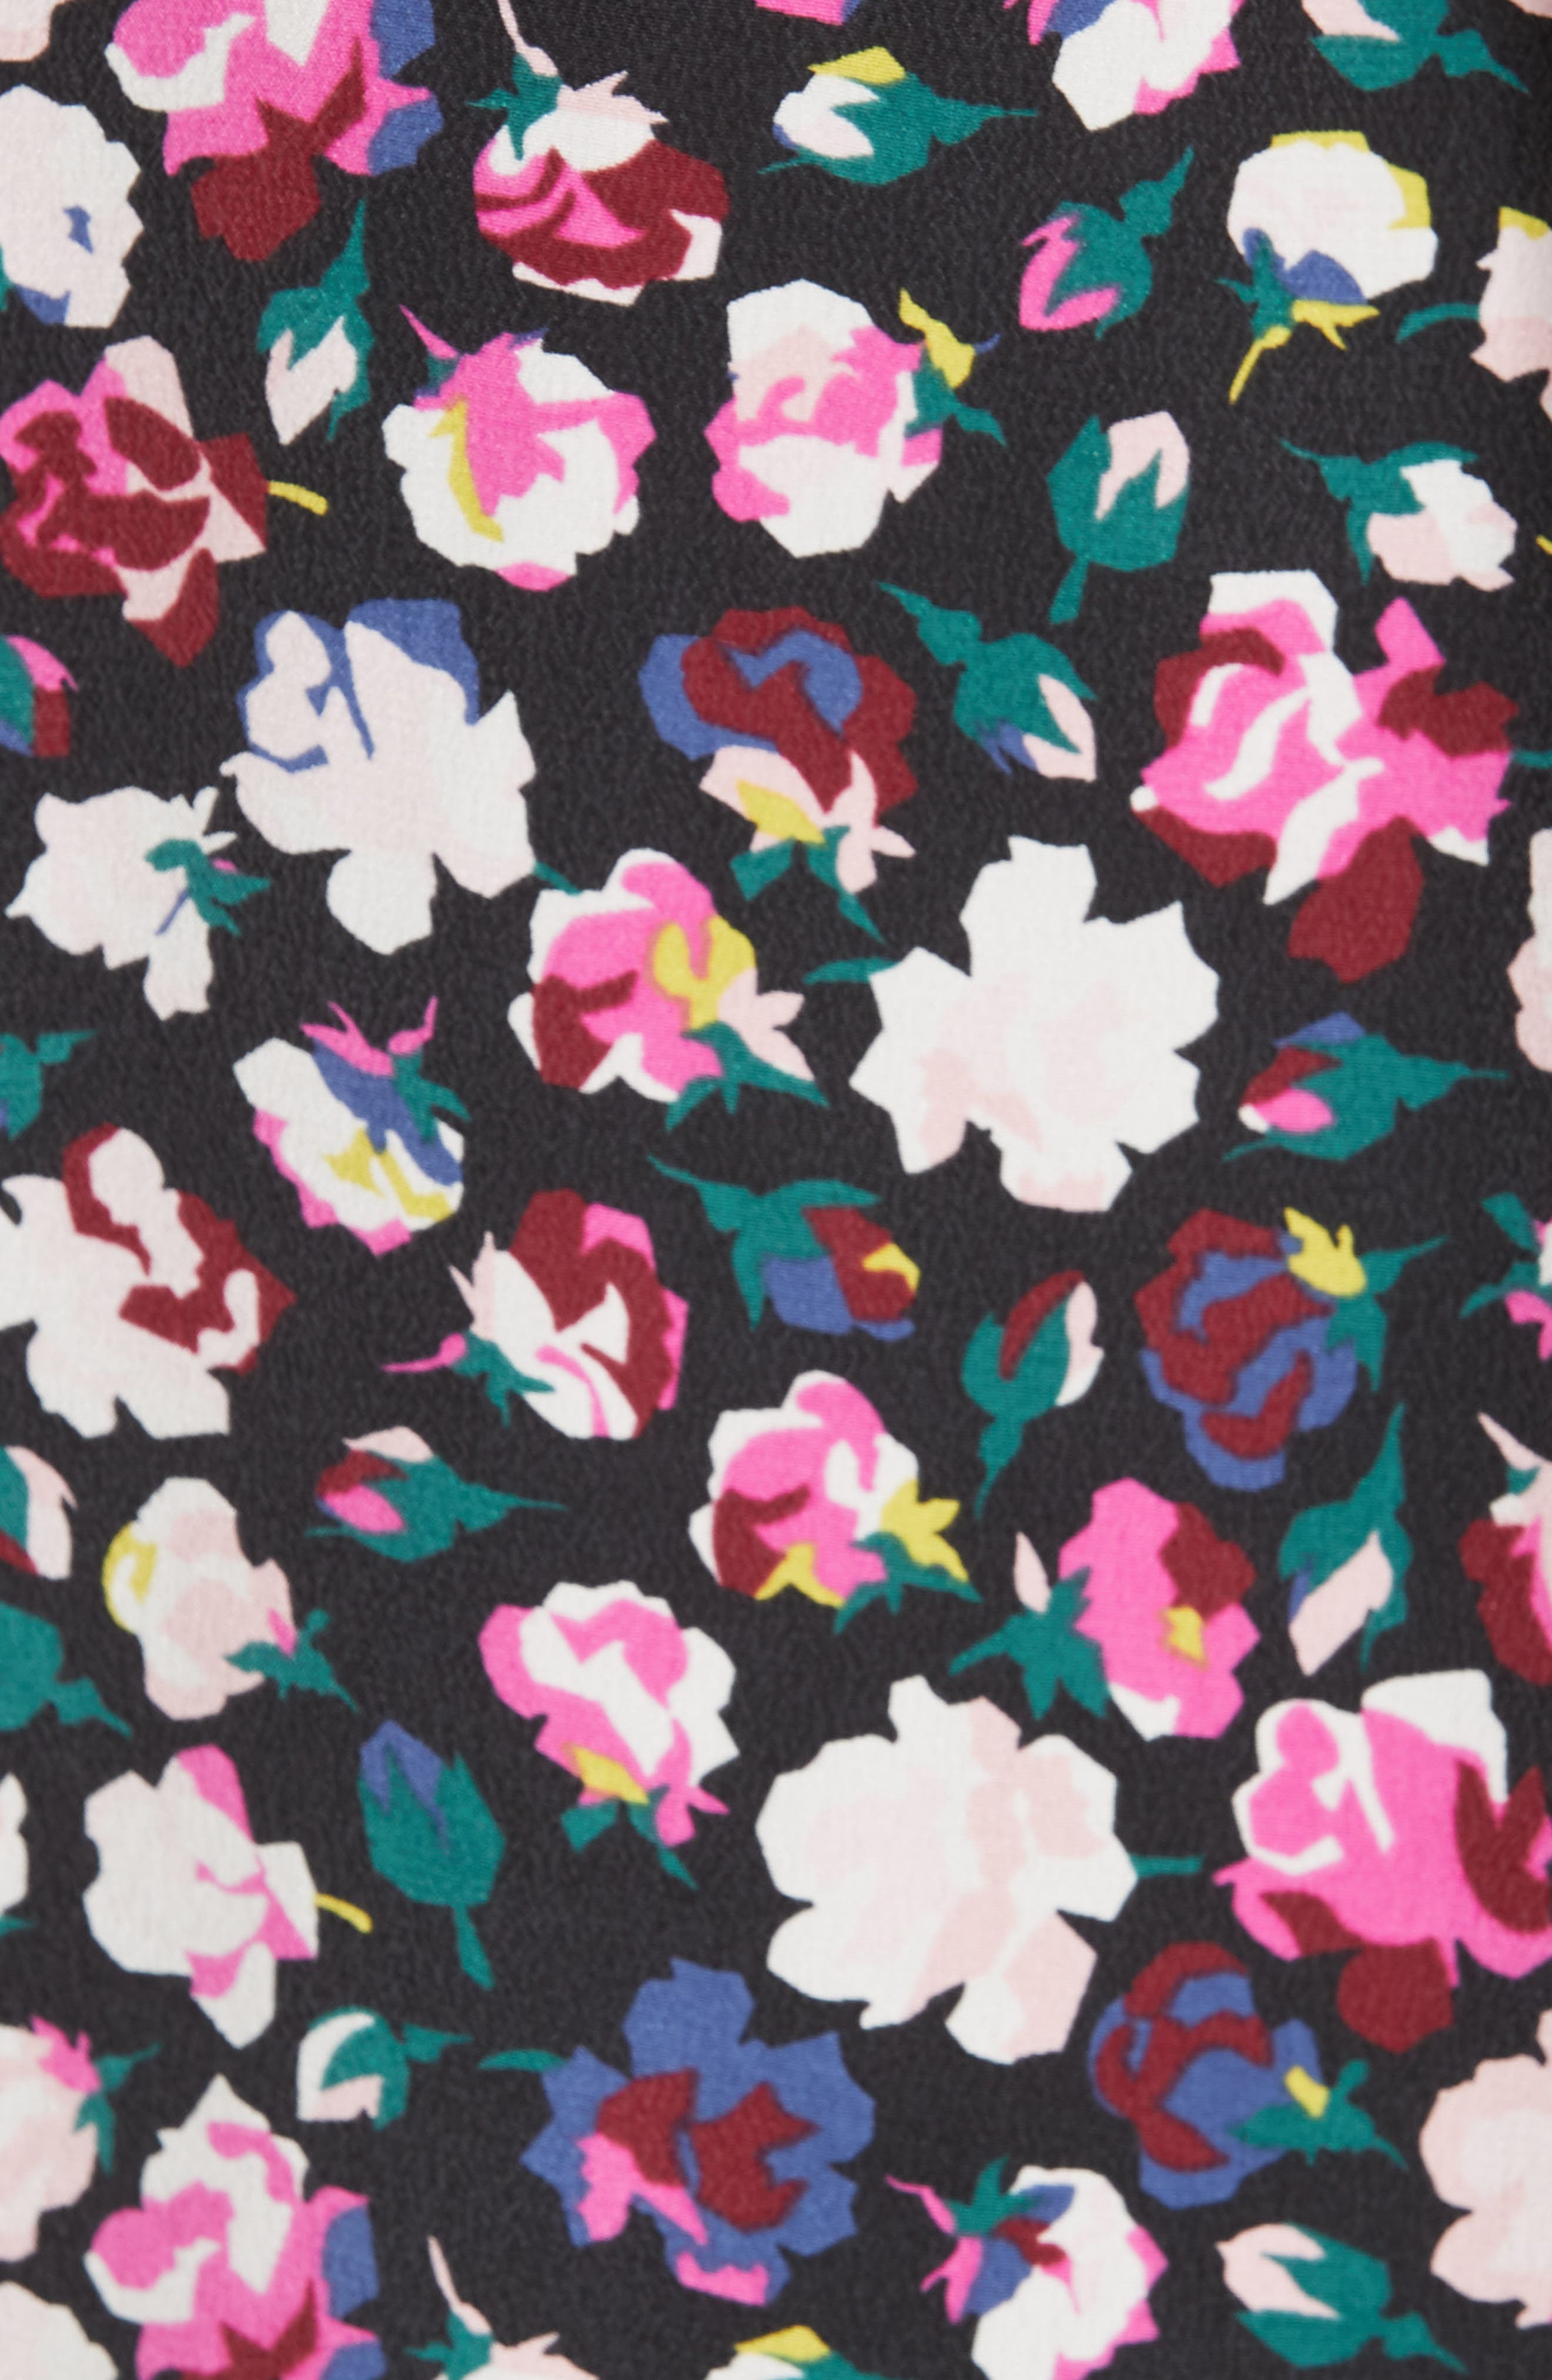 Slim Signature Floral Blouse,                             Alternate thumbnail 5, color,                             TRUE BLACK MULTI